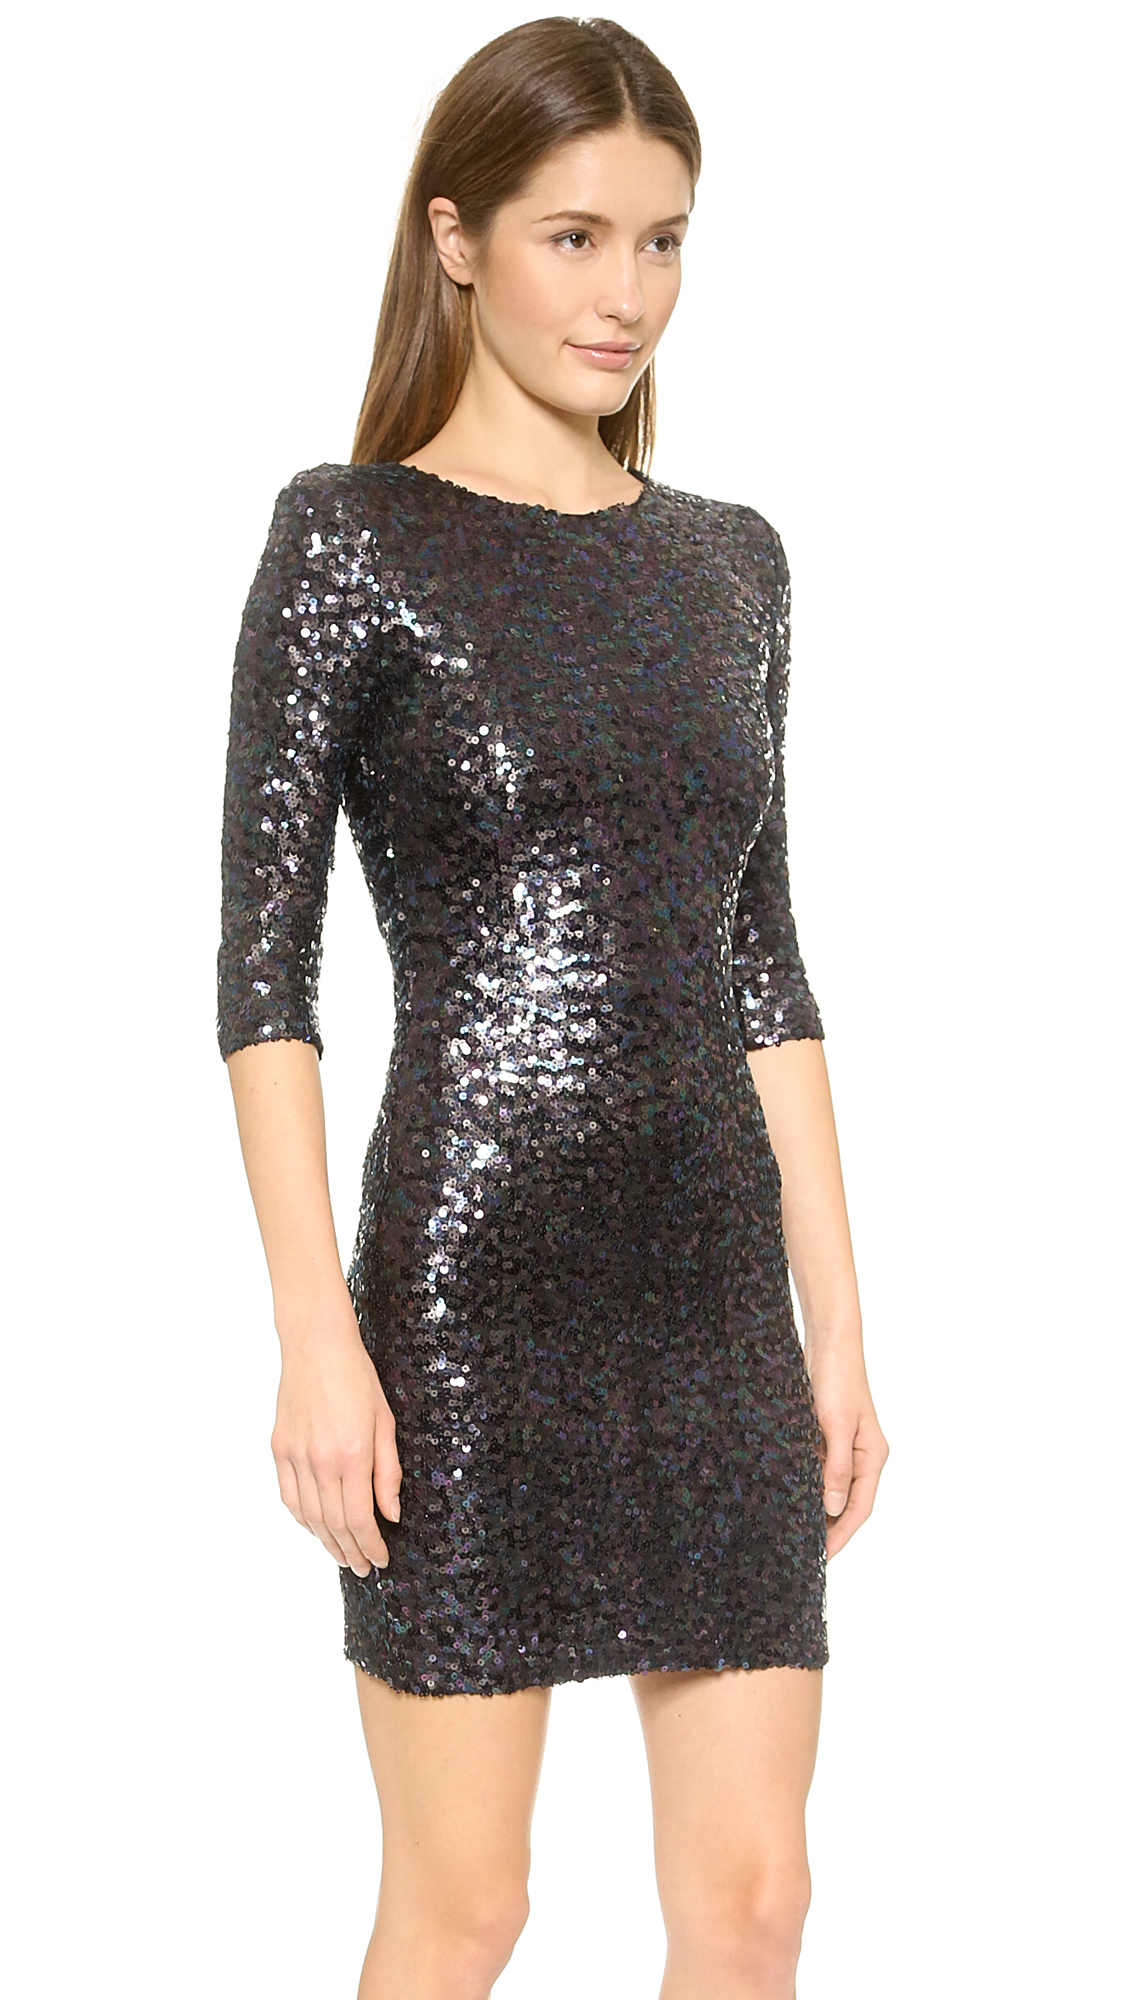 Bb dakota Villette Sequin Dress in Metallic - Lyst